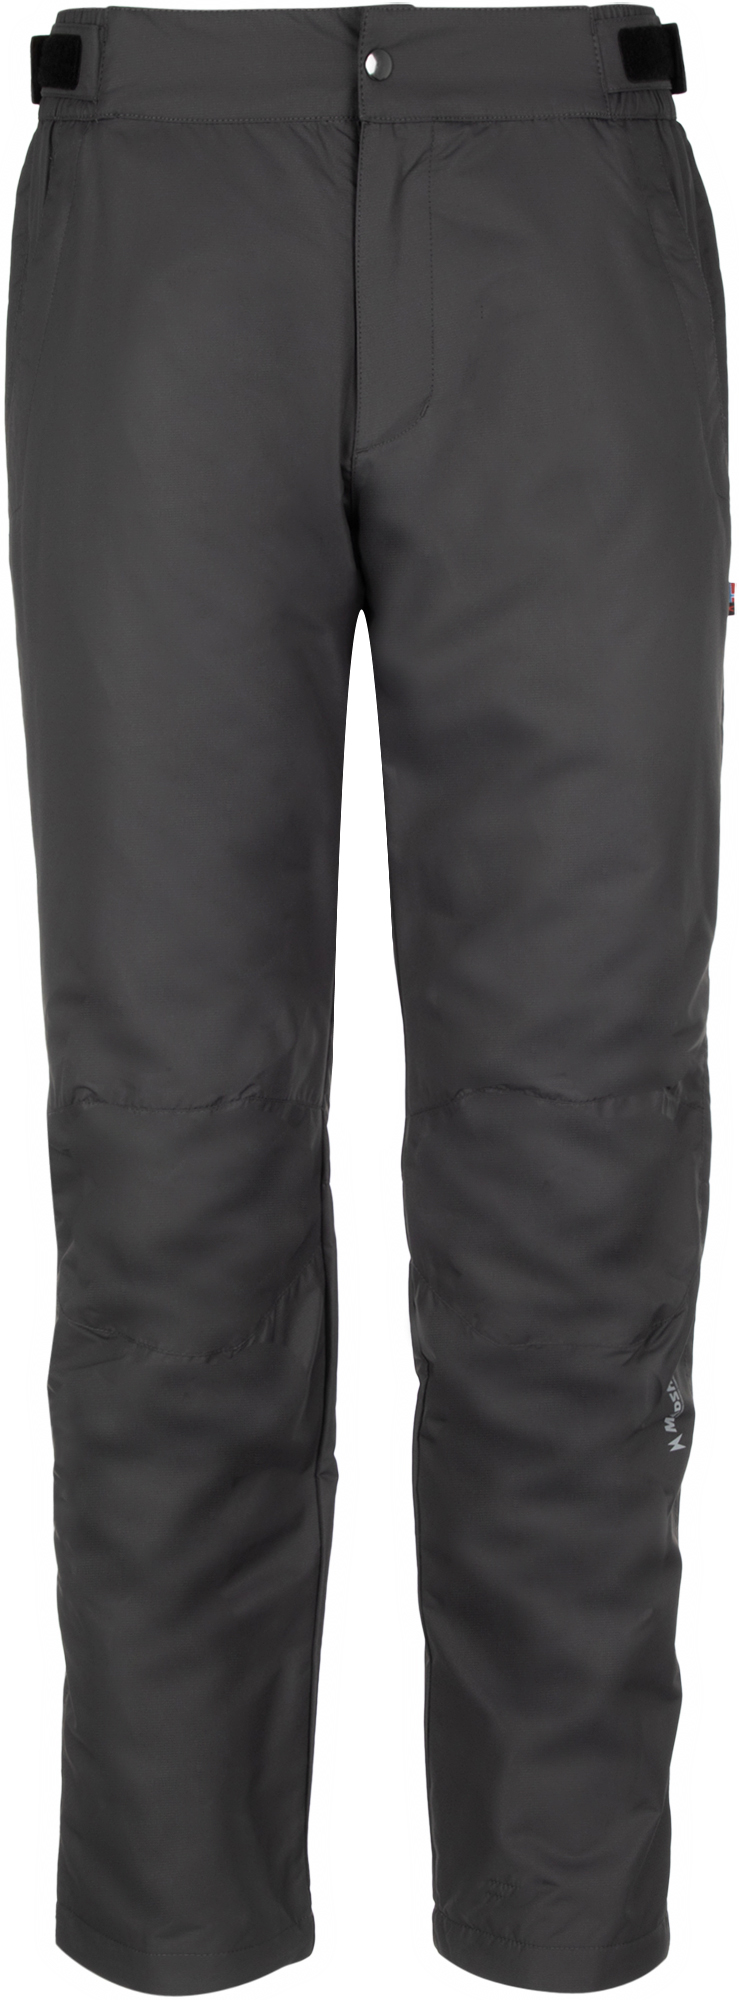 Madshus Брюки утепленные мужские Madshus, размер 56 брюки мужские oodji цвет темно синий 2b200024m 47530n 7900n размер 48 56 182